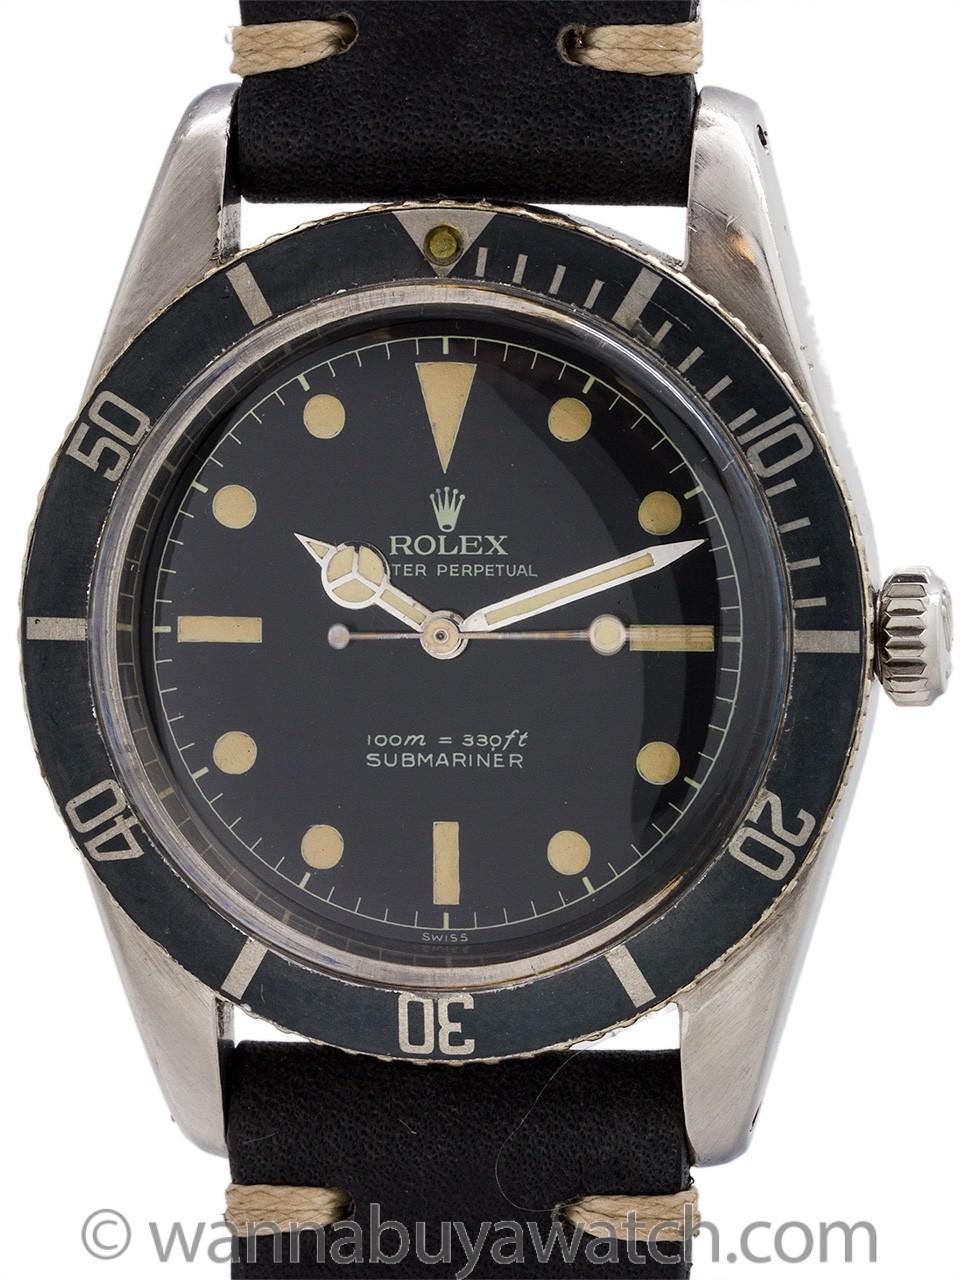 Rolex James Bond Submariner ref 6536 circa 1953